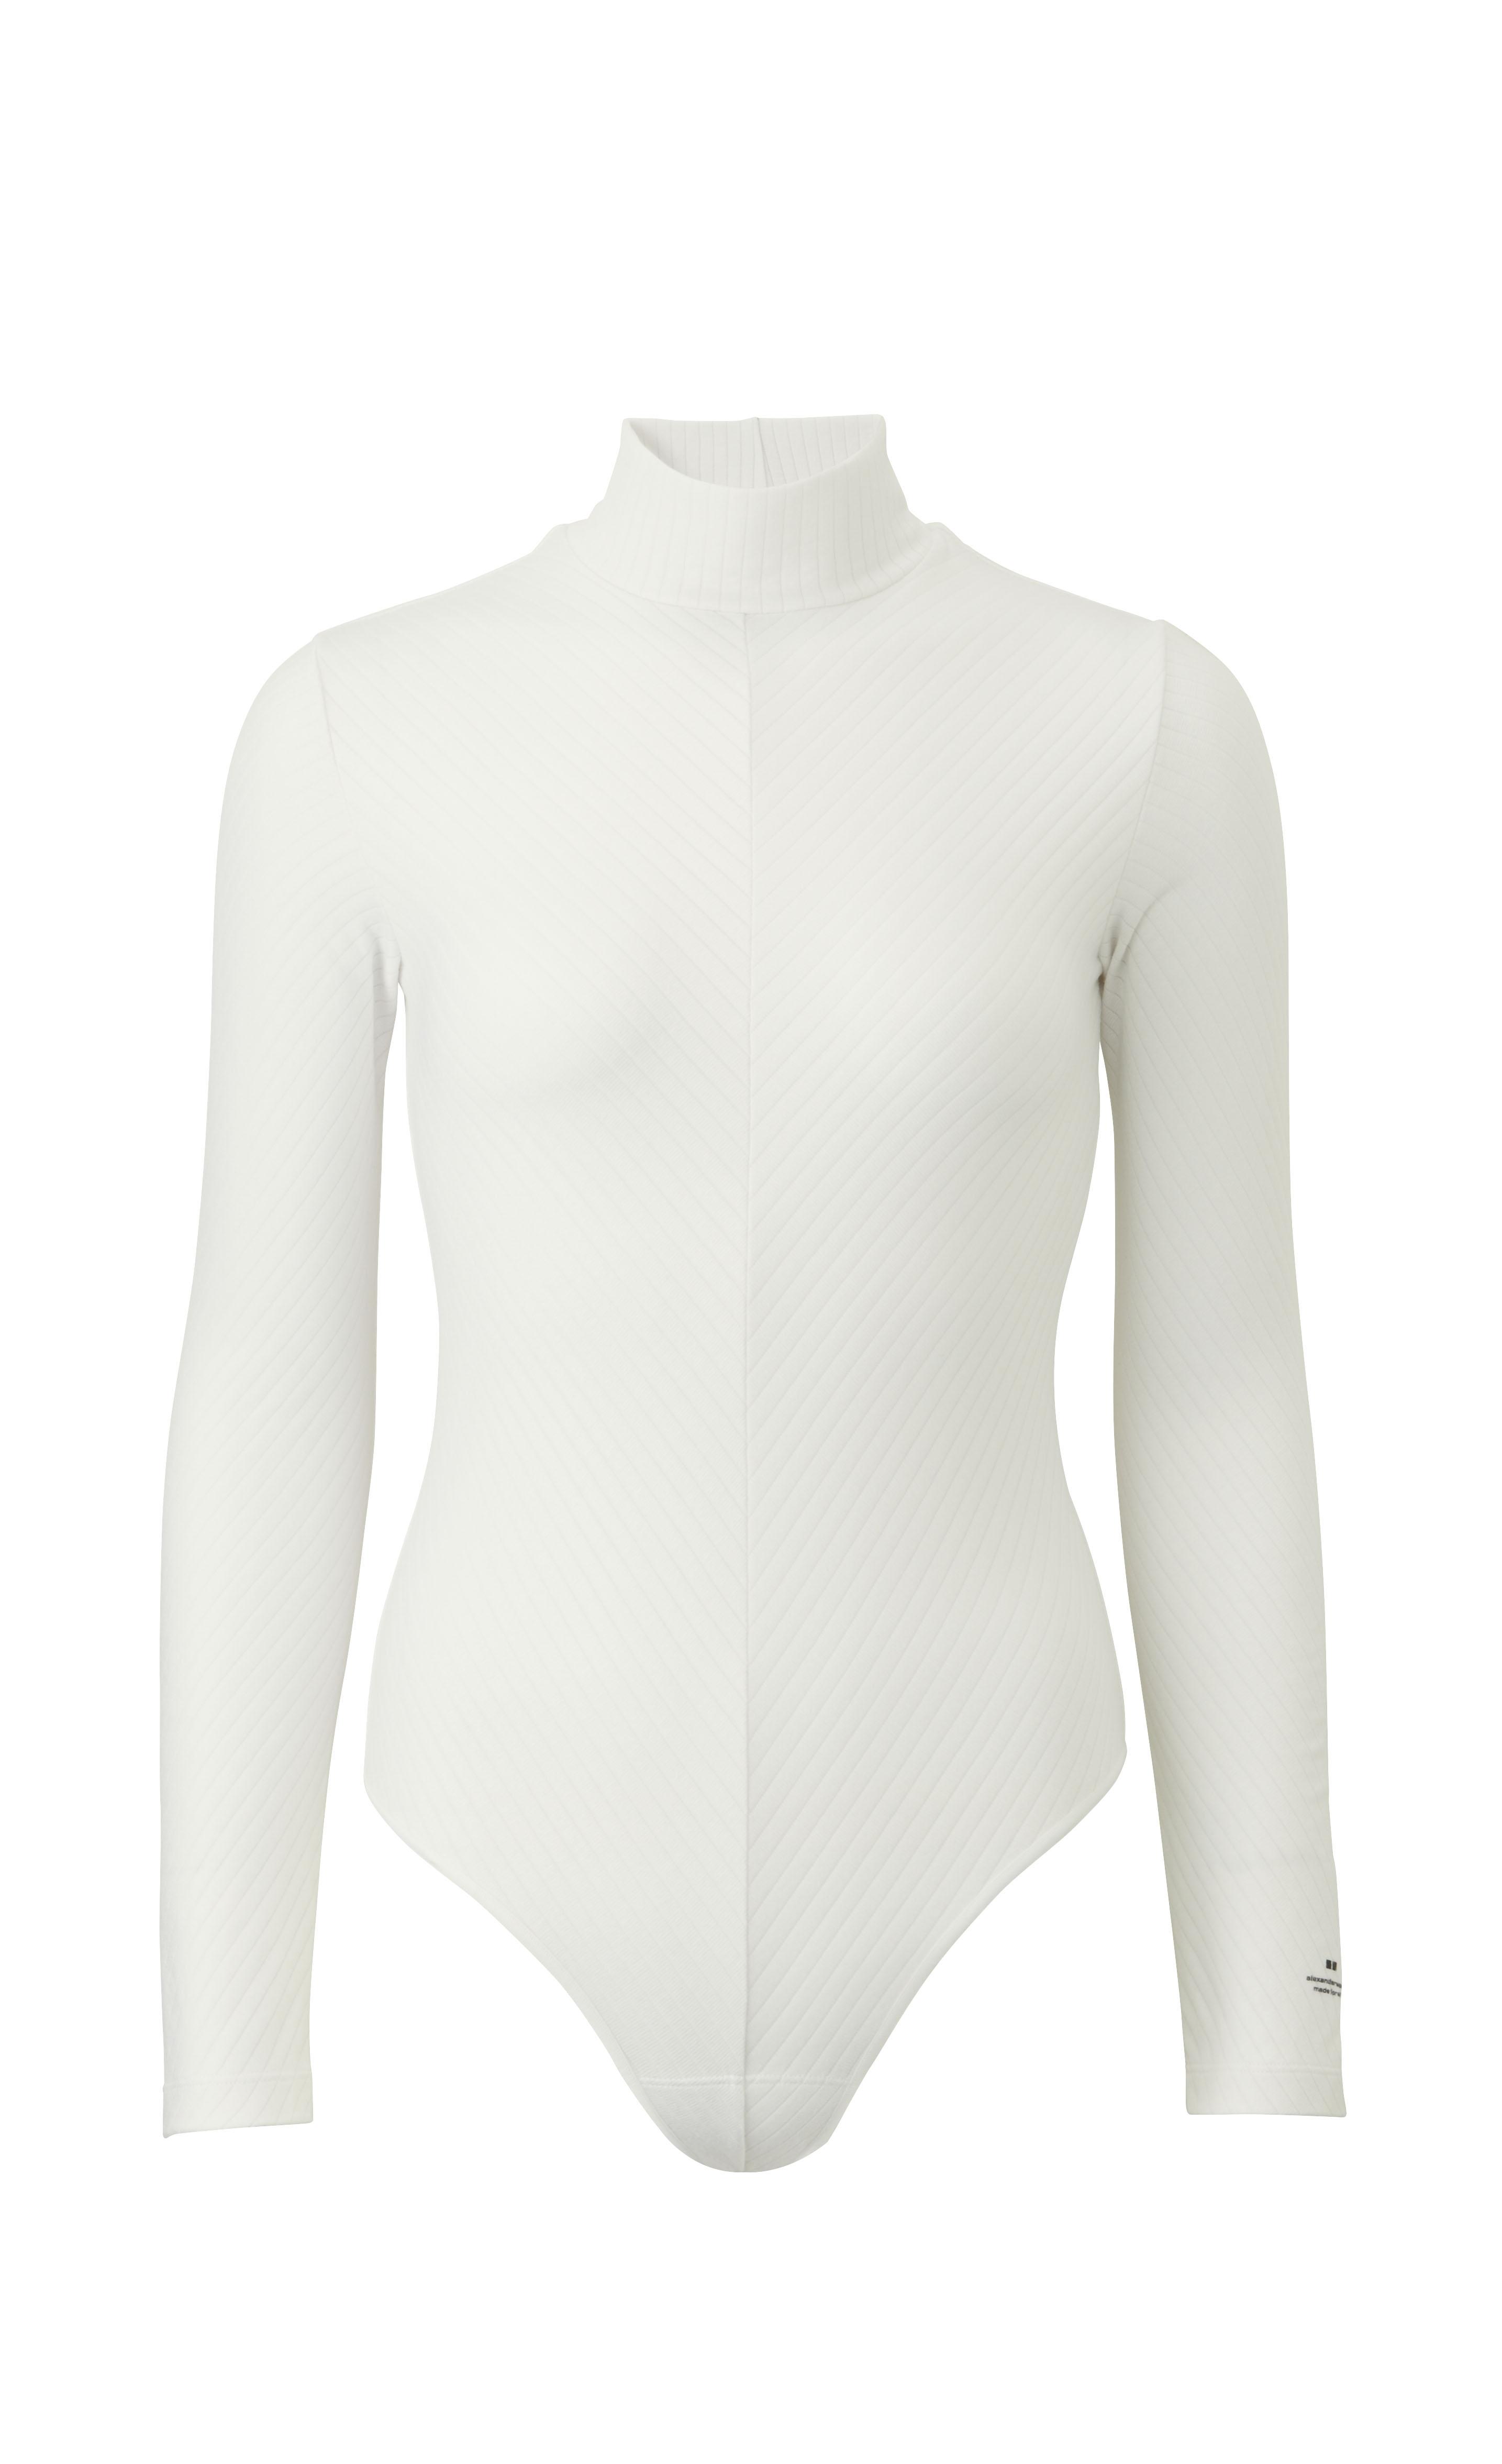 8c3caf3a27 Alexander Wang x Uniqlo Women Heattech Extra Warm Long-Sleeve Bodysuit